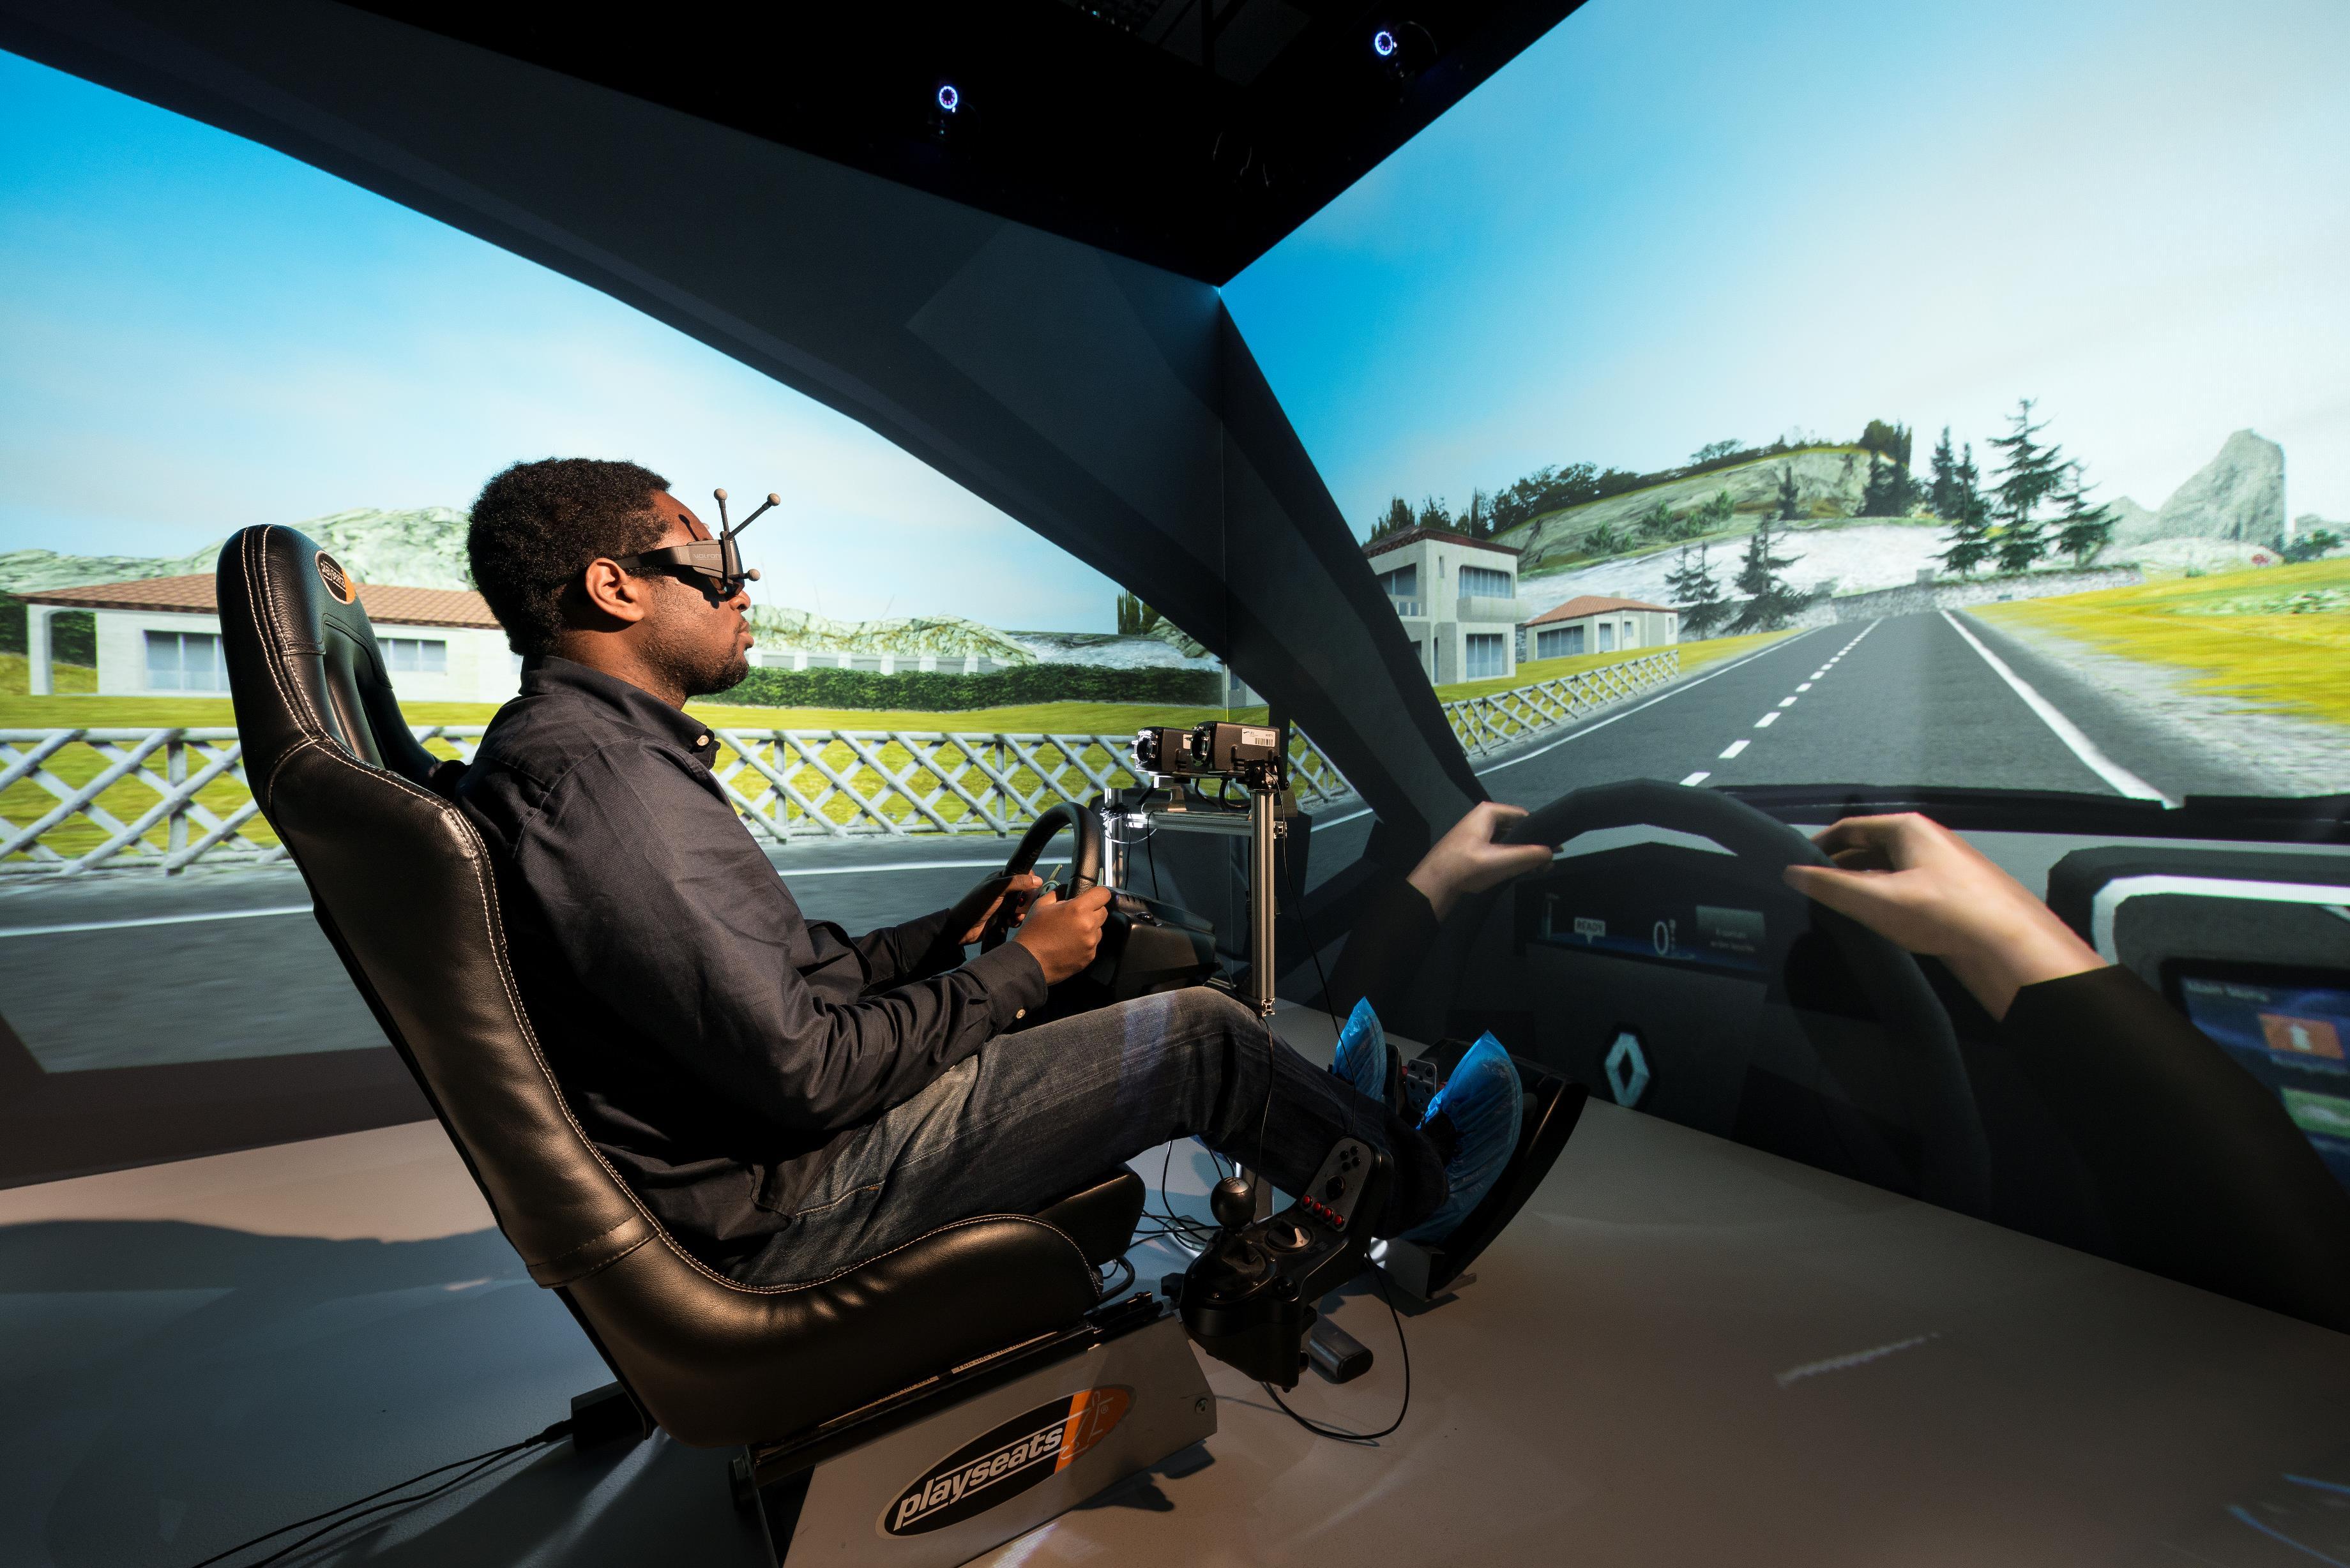 Heudyasic driving simulator